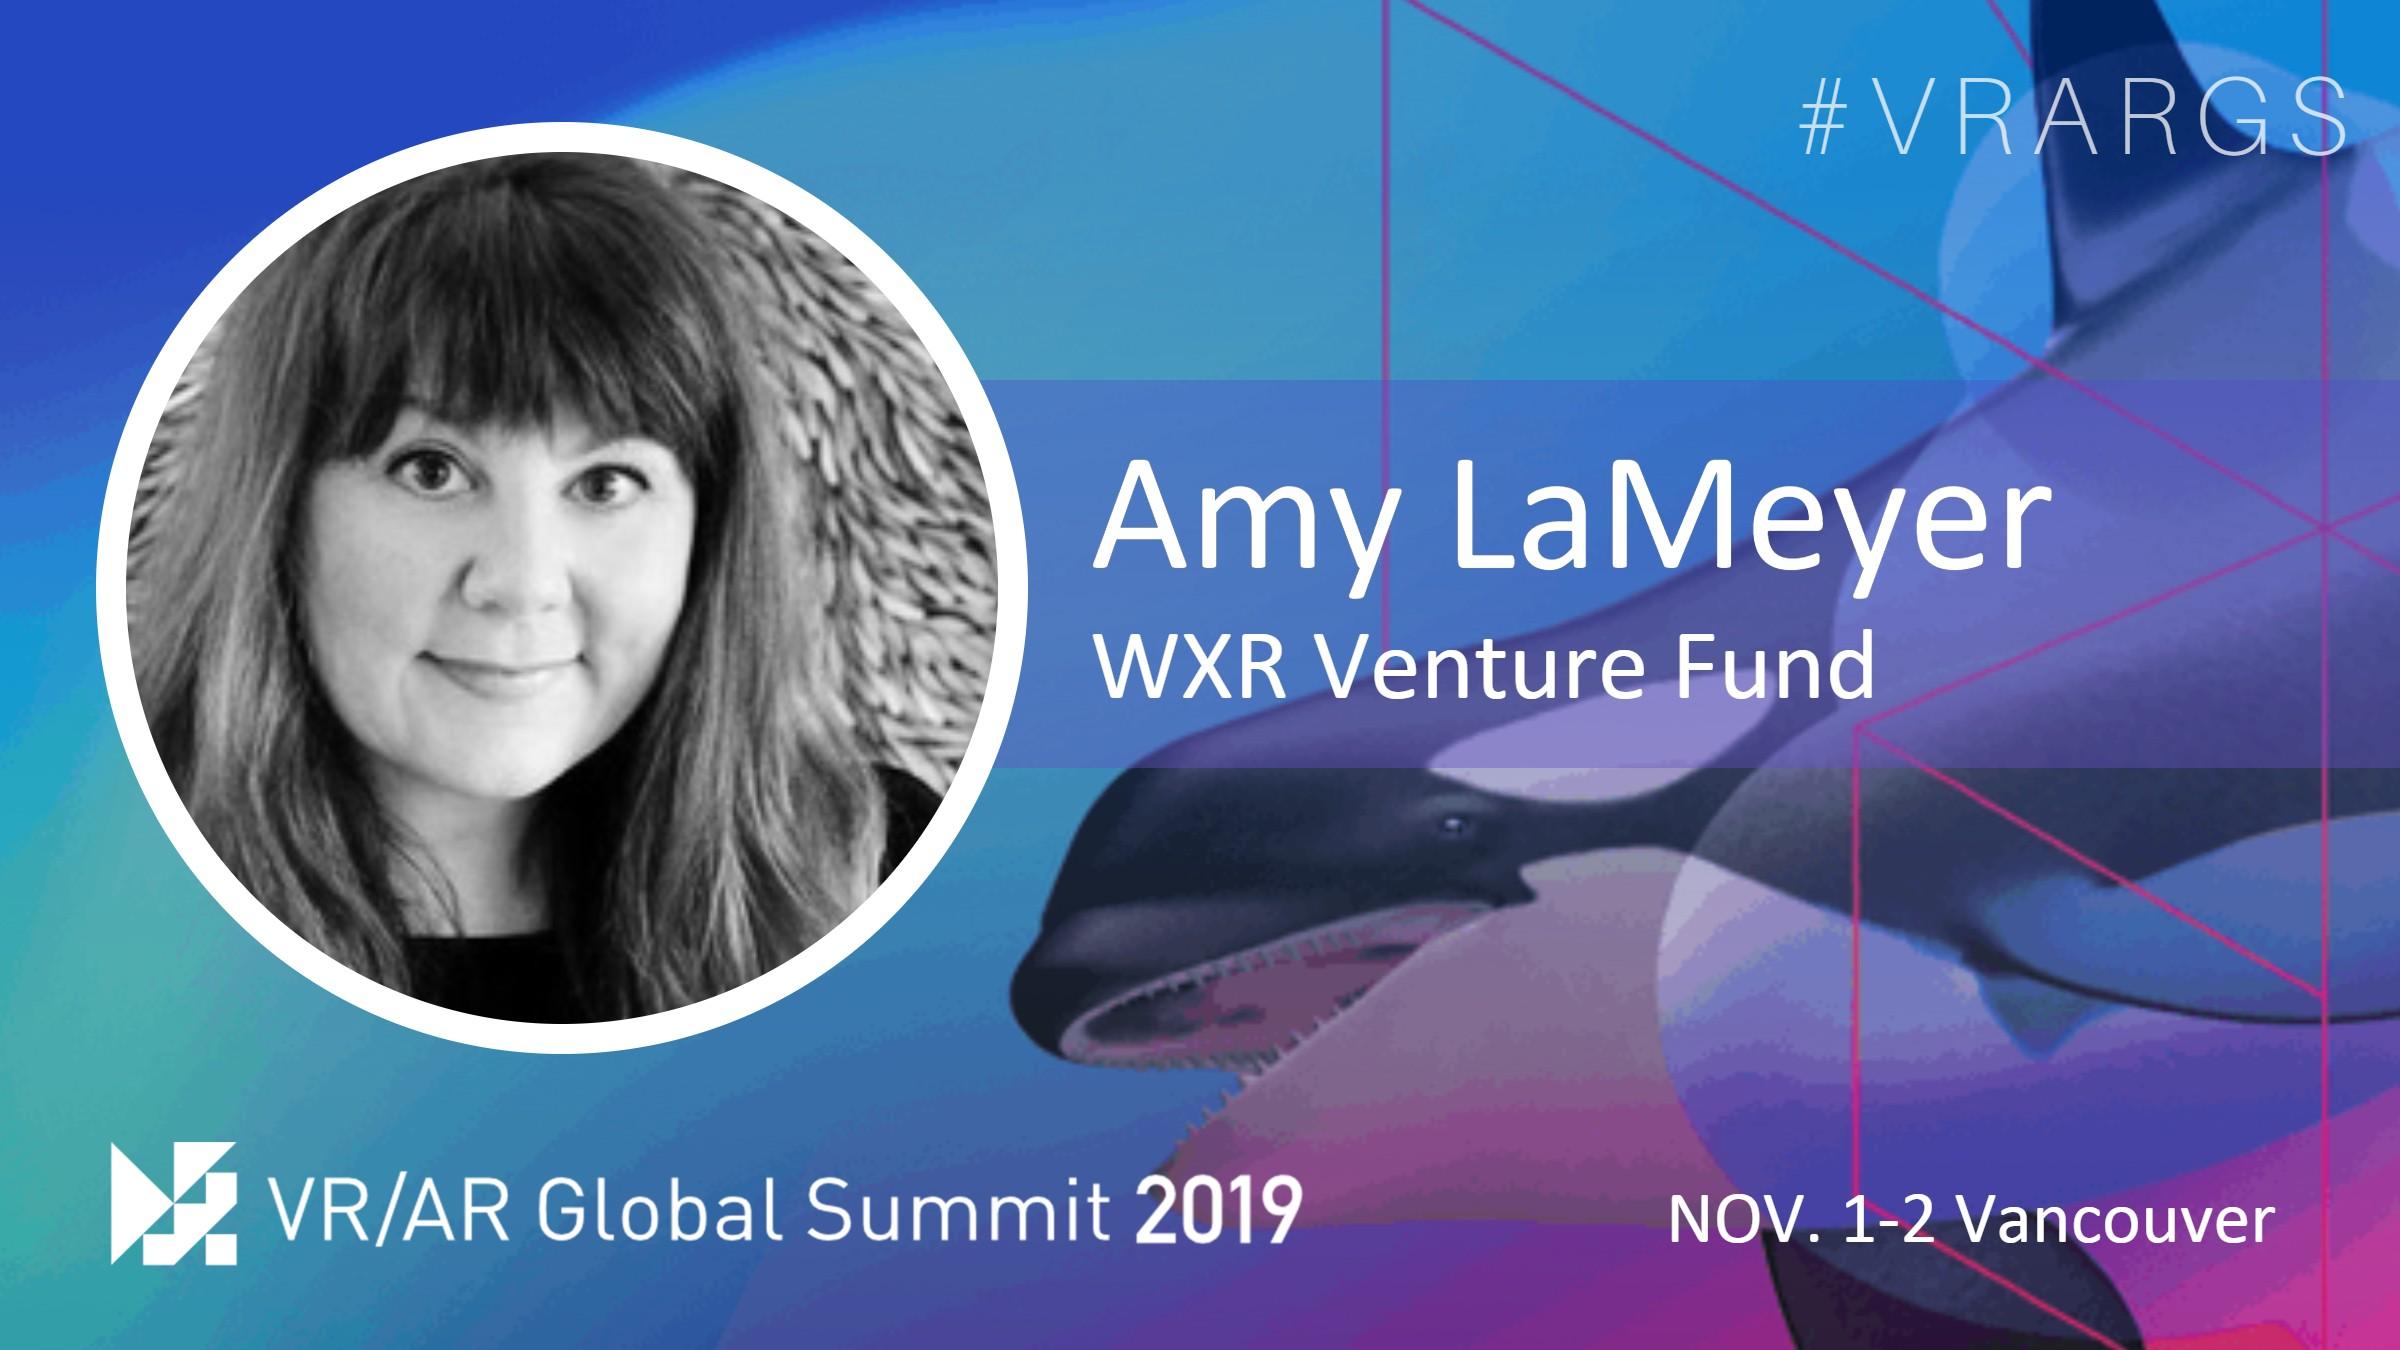 HighRes-Amy-La-Meyer-WXR-Venture-Fund-Women-In-XR-VRARGS-VRAR-Global-Summit-Spatial-Computing-Vancouver-Women-In-XR.jpg